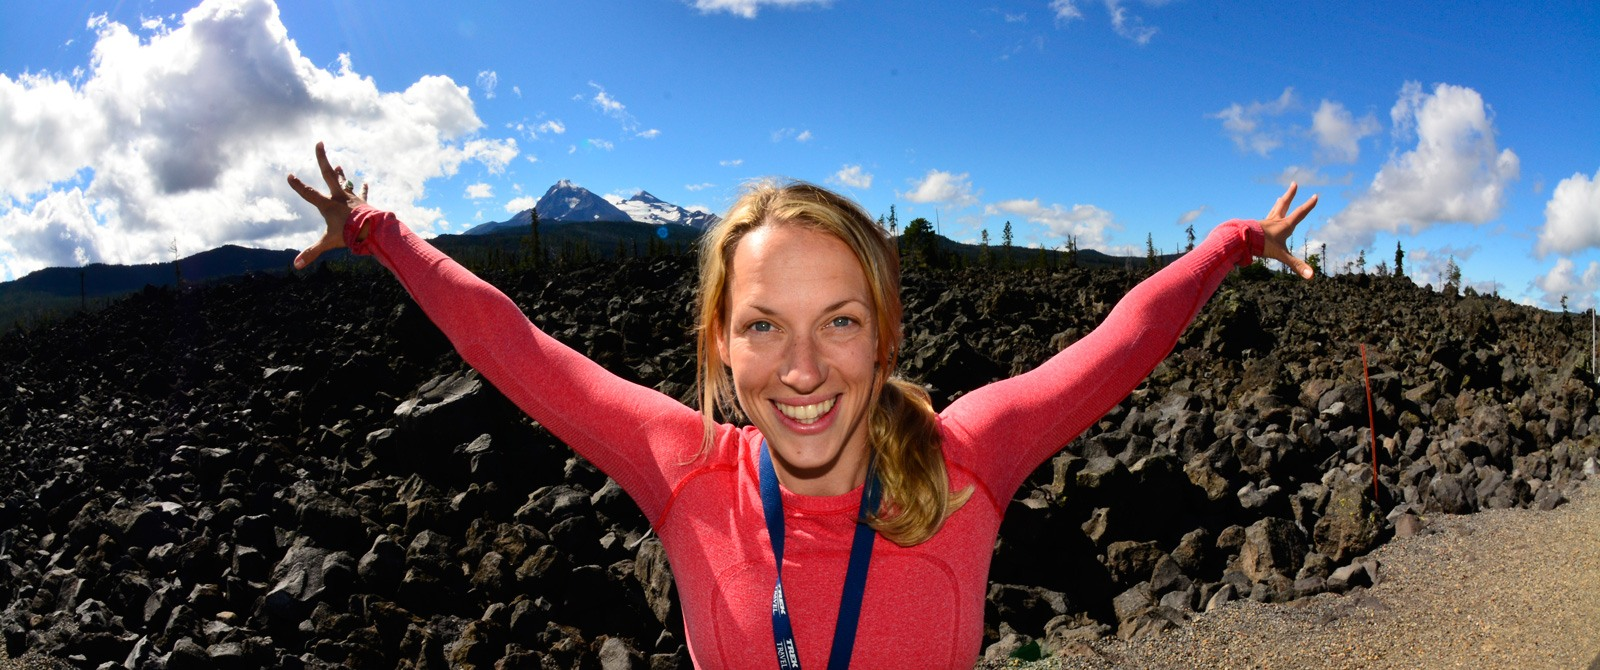 Trek Travel Cycling Guide Elizabeth White